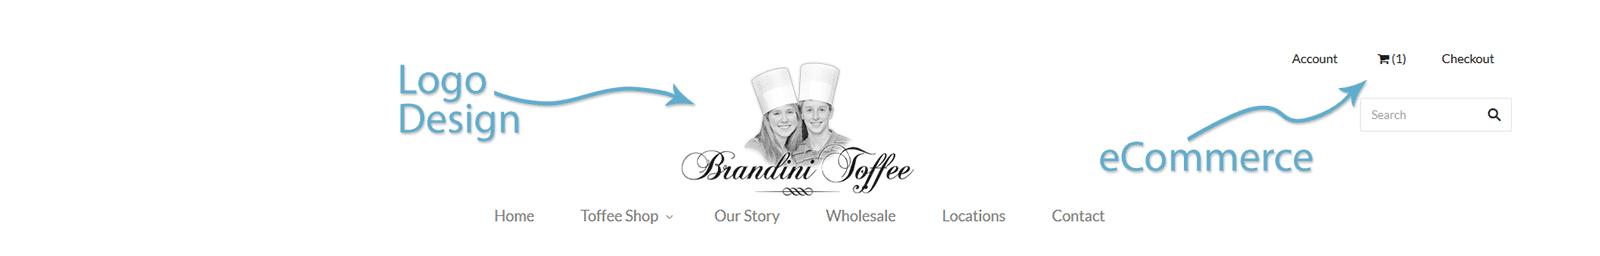 Logo Design and eCommerce Websites